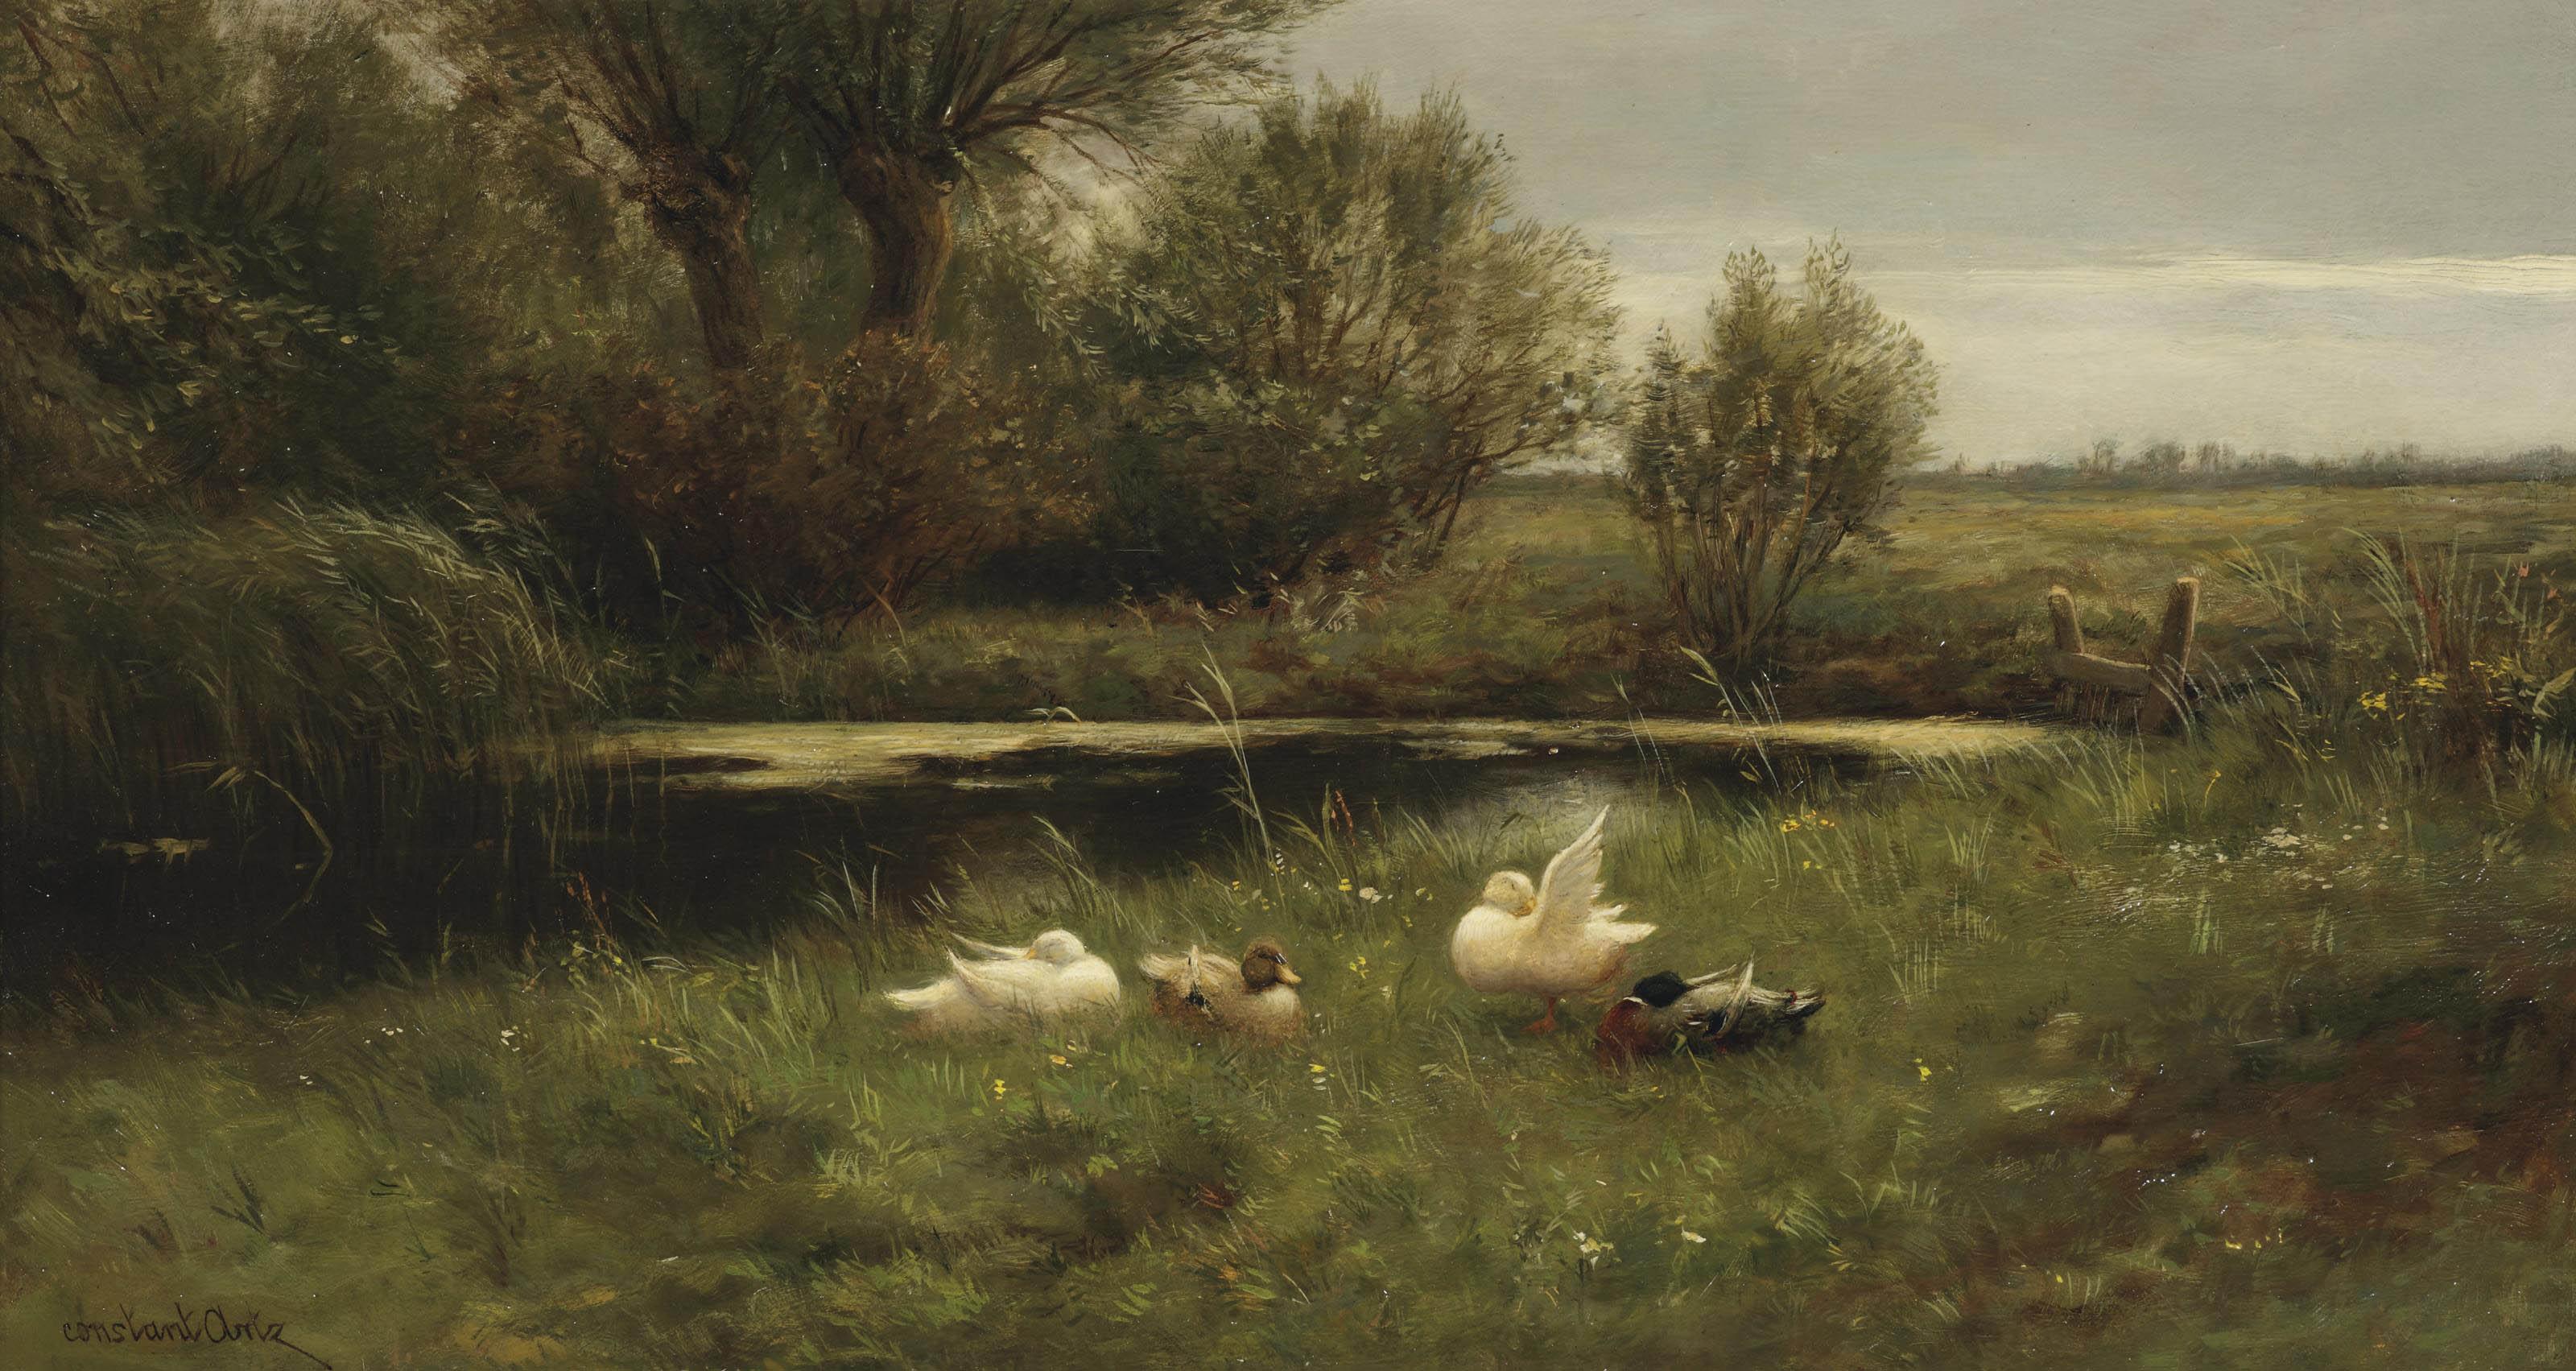 Ducks in a sunlit river landscape